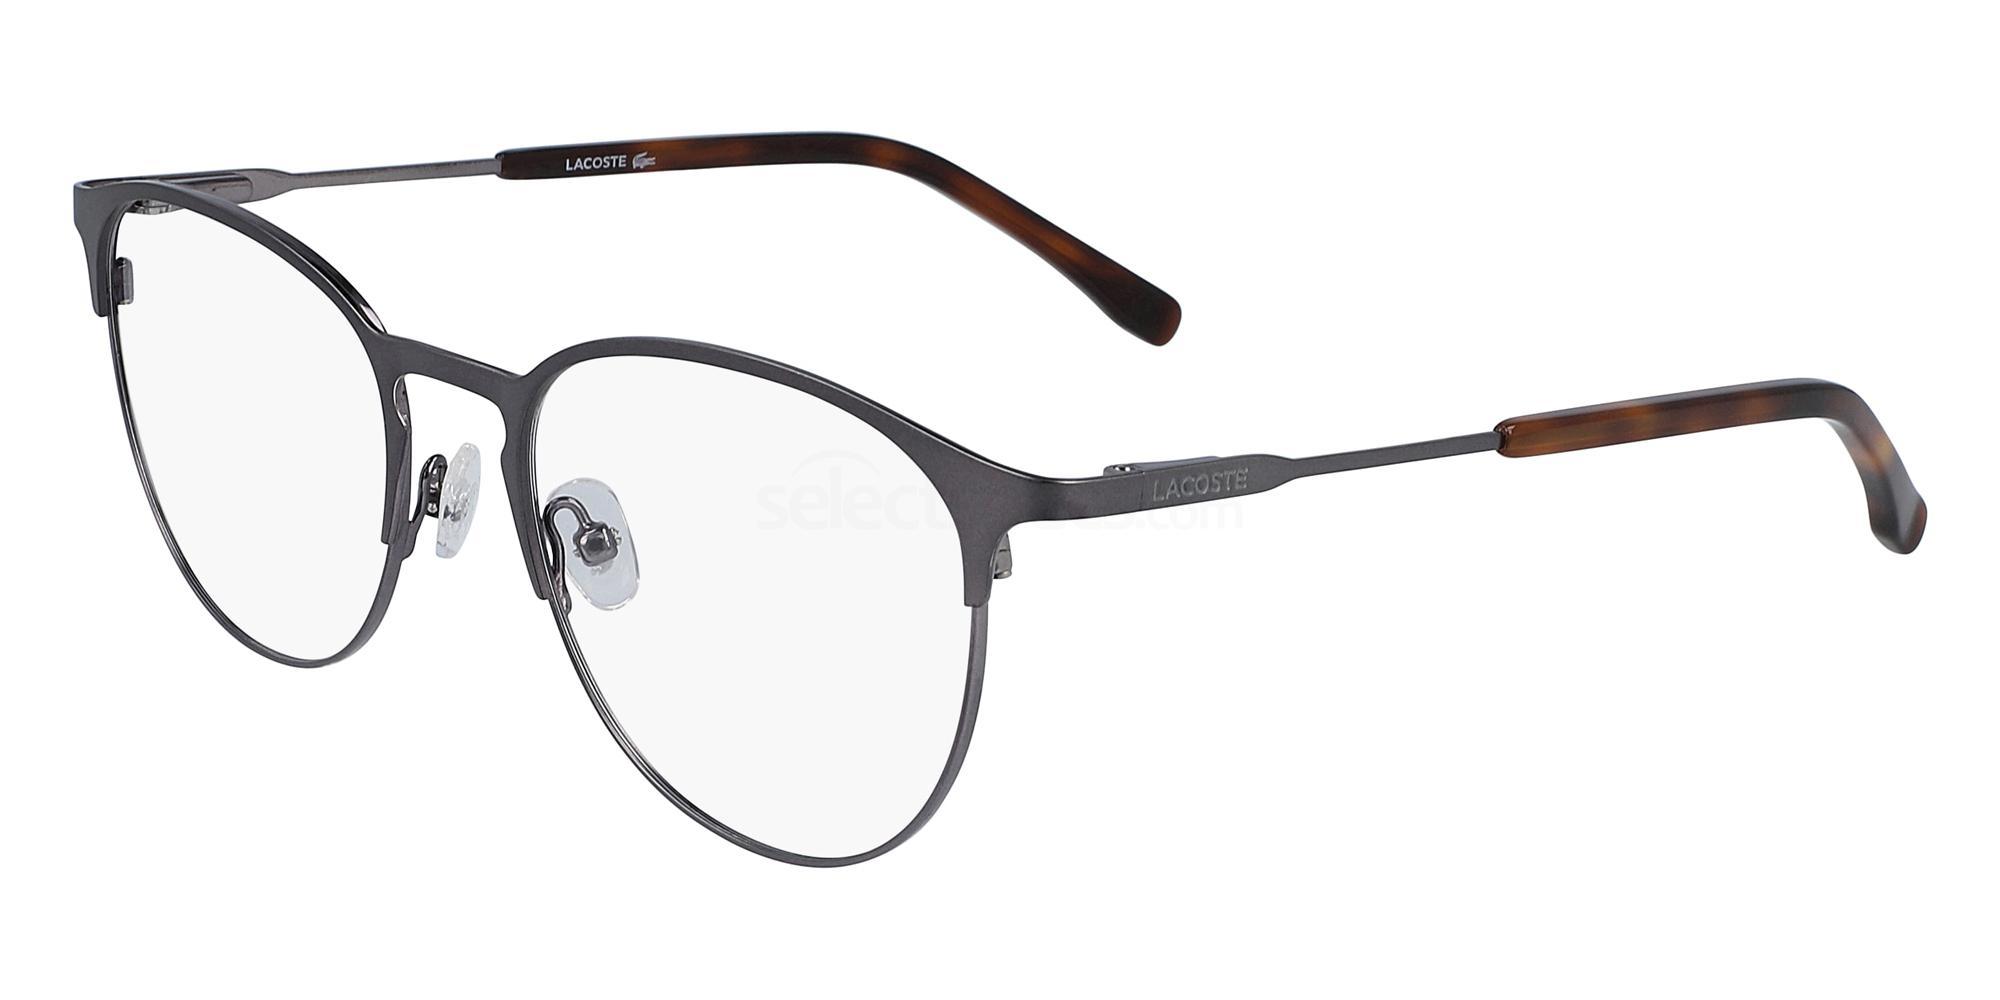 033 L2251 Glasses, Lacoste